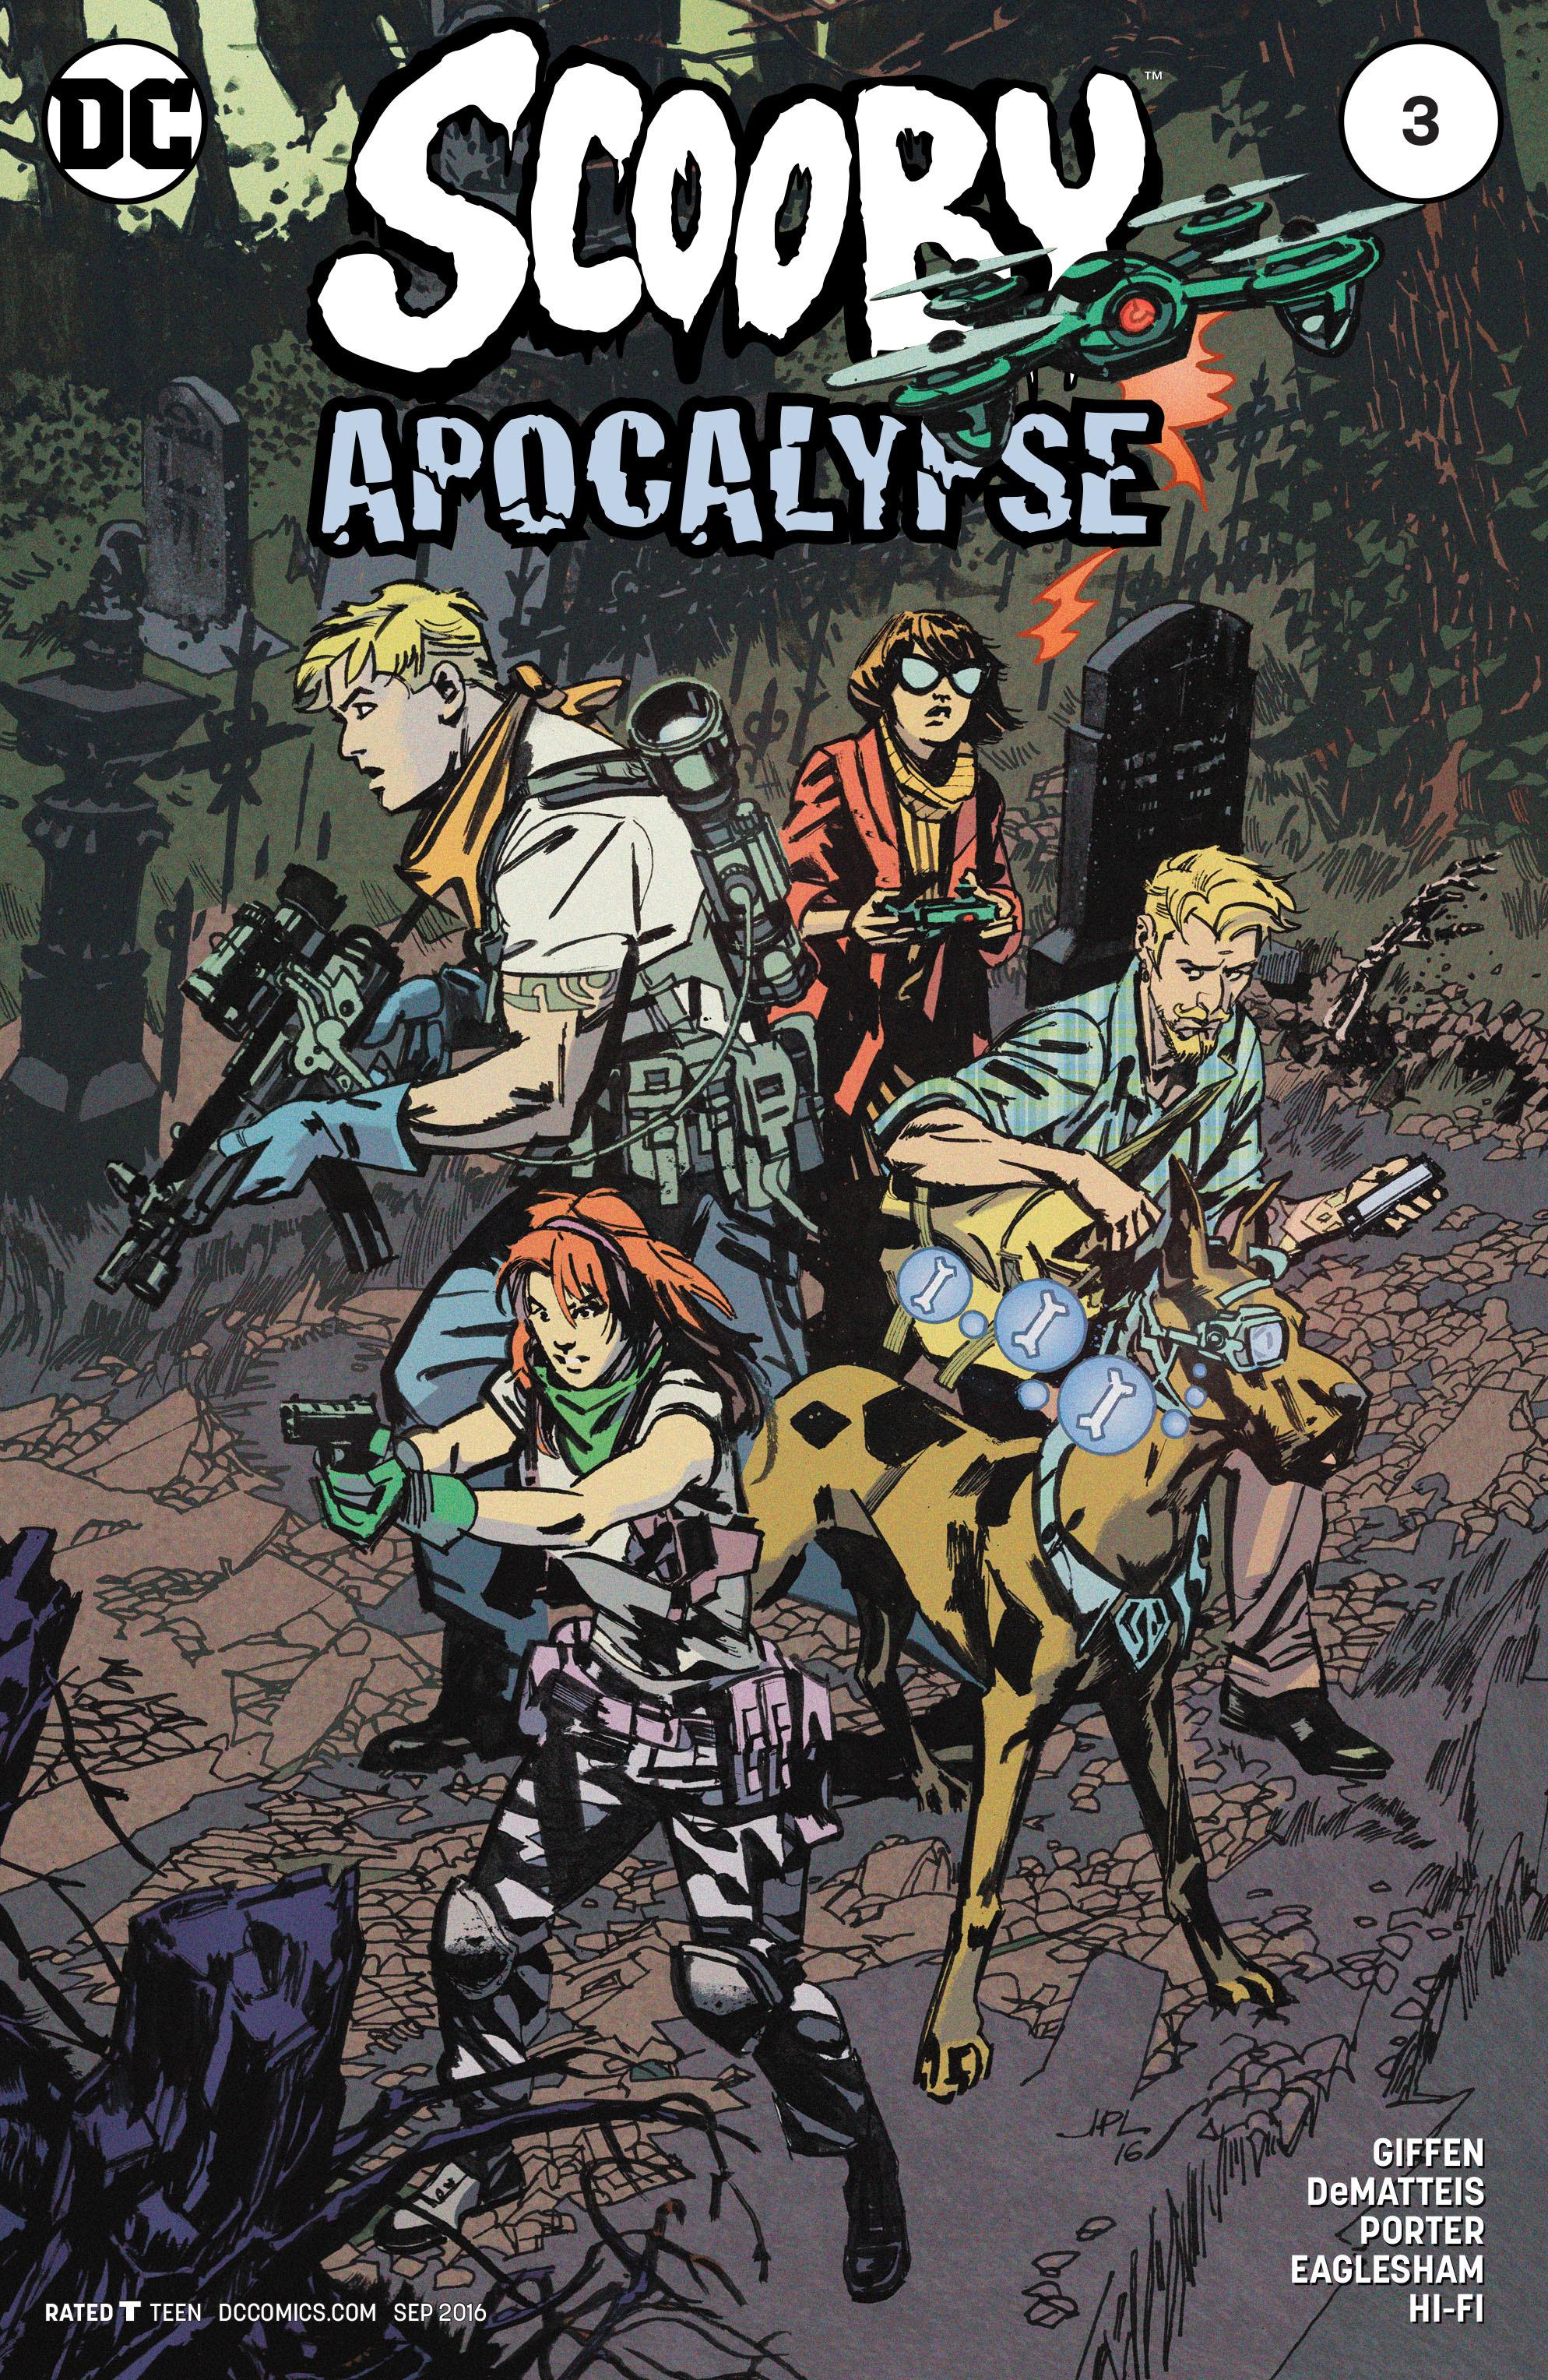 Read online Scooby Apocalypse comic -  Issue #3 - 3